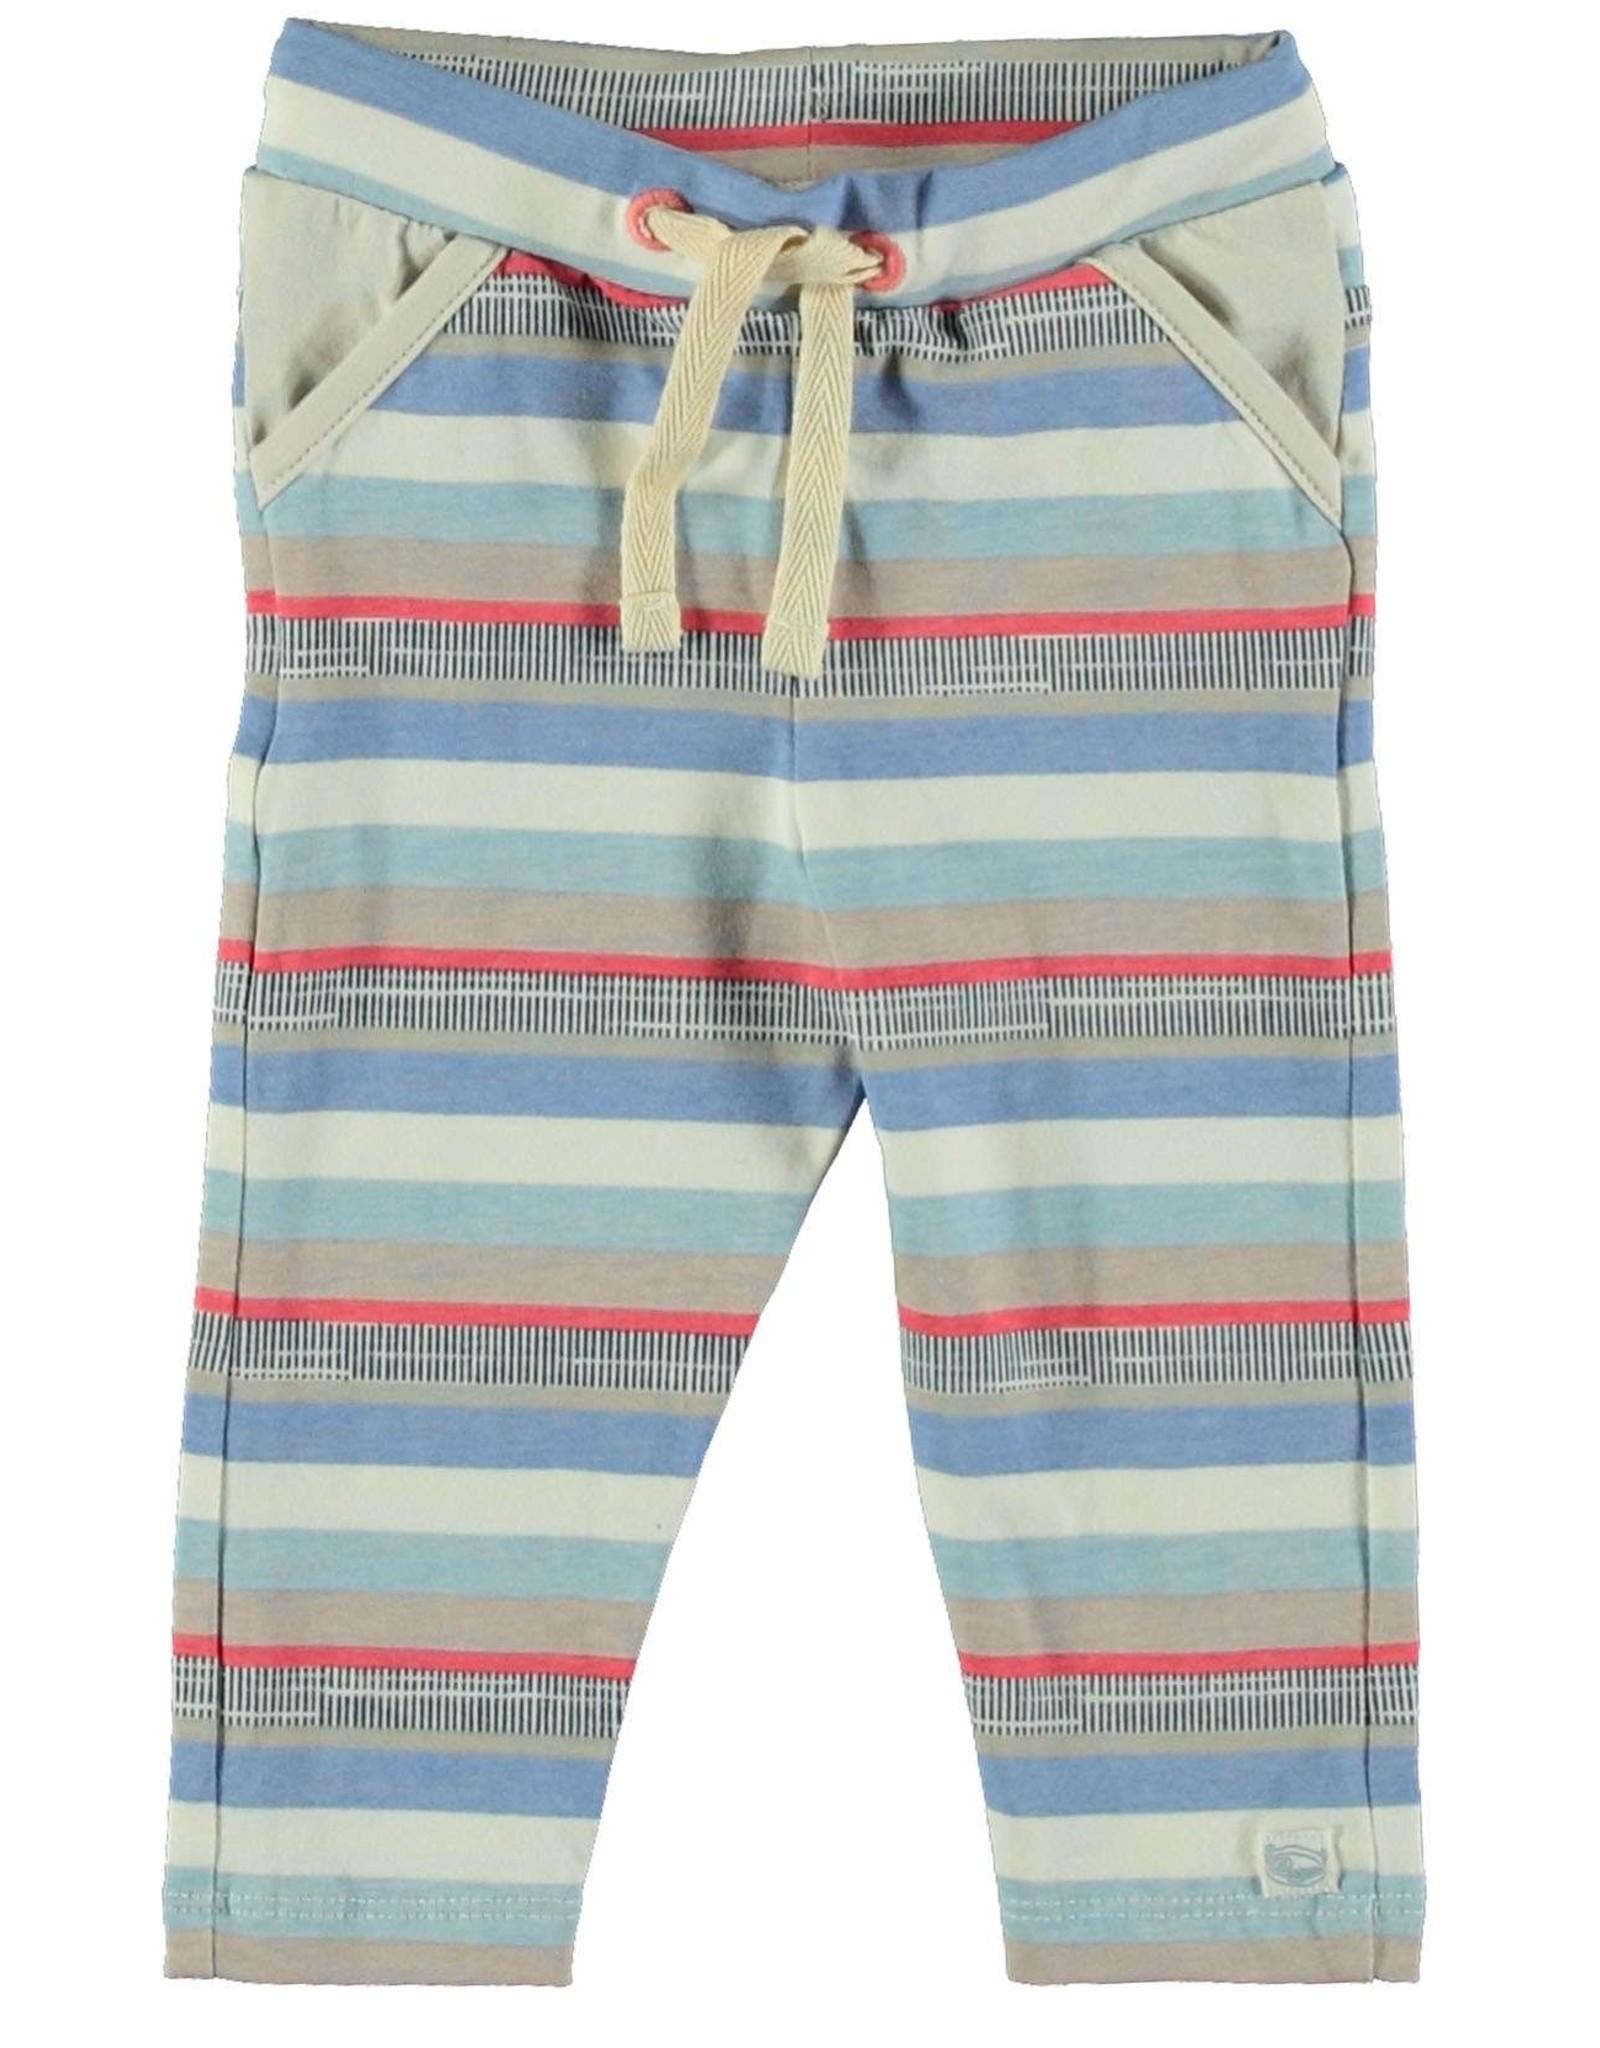 Moodsteet Baby Moodstreet Baby Pants with pockets Multi Stripe